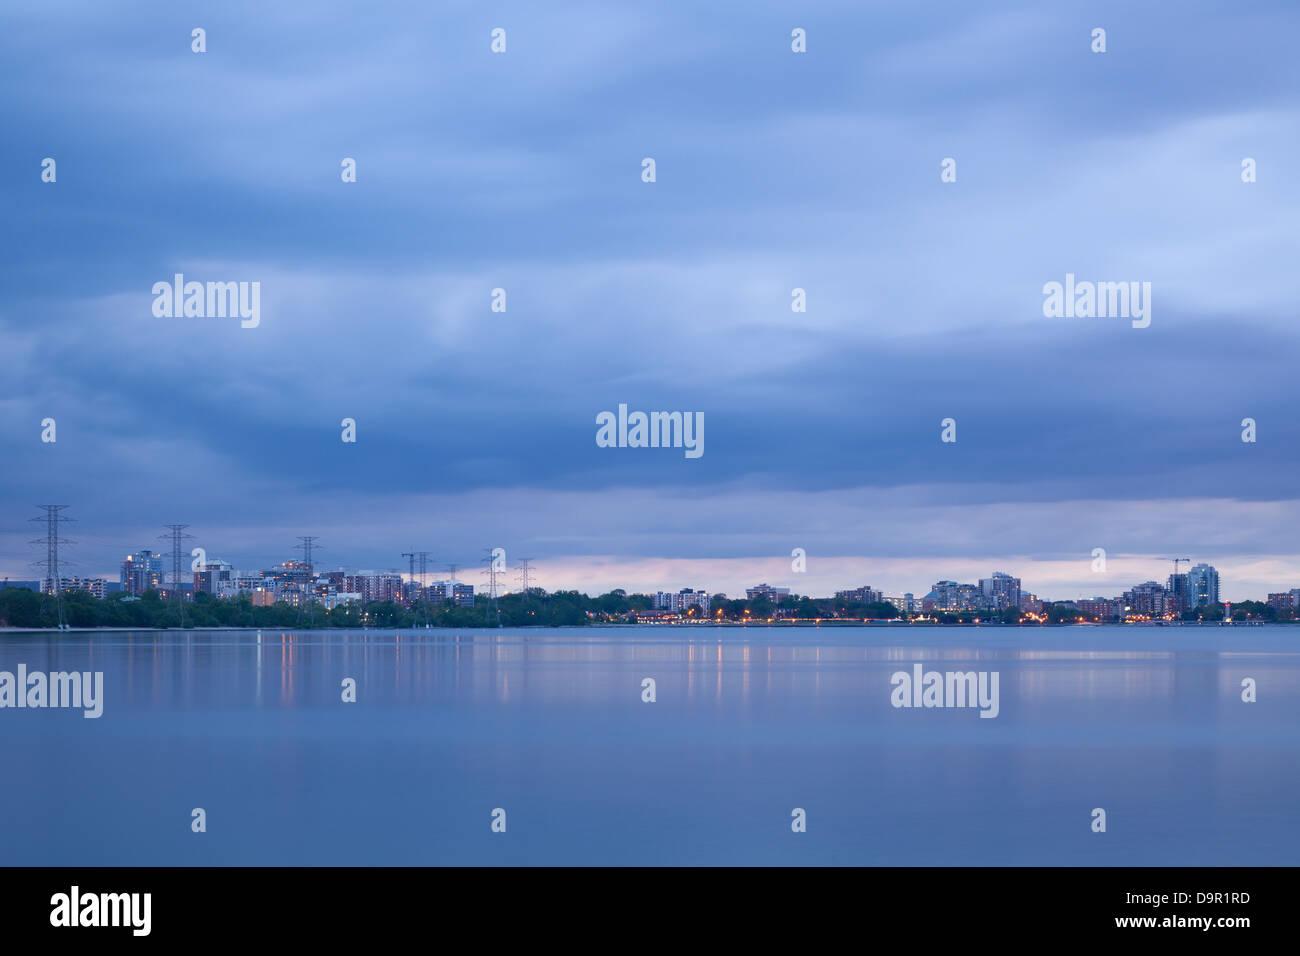 Downtown Burlington (Skyline) at dusk, over Lake Ontario, Burlington, Ontario, Canada. - Stock Image